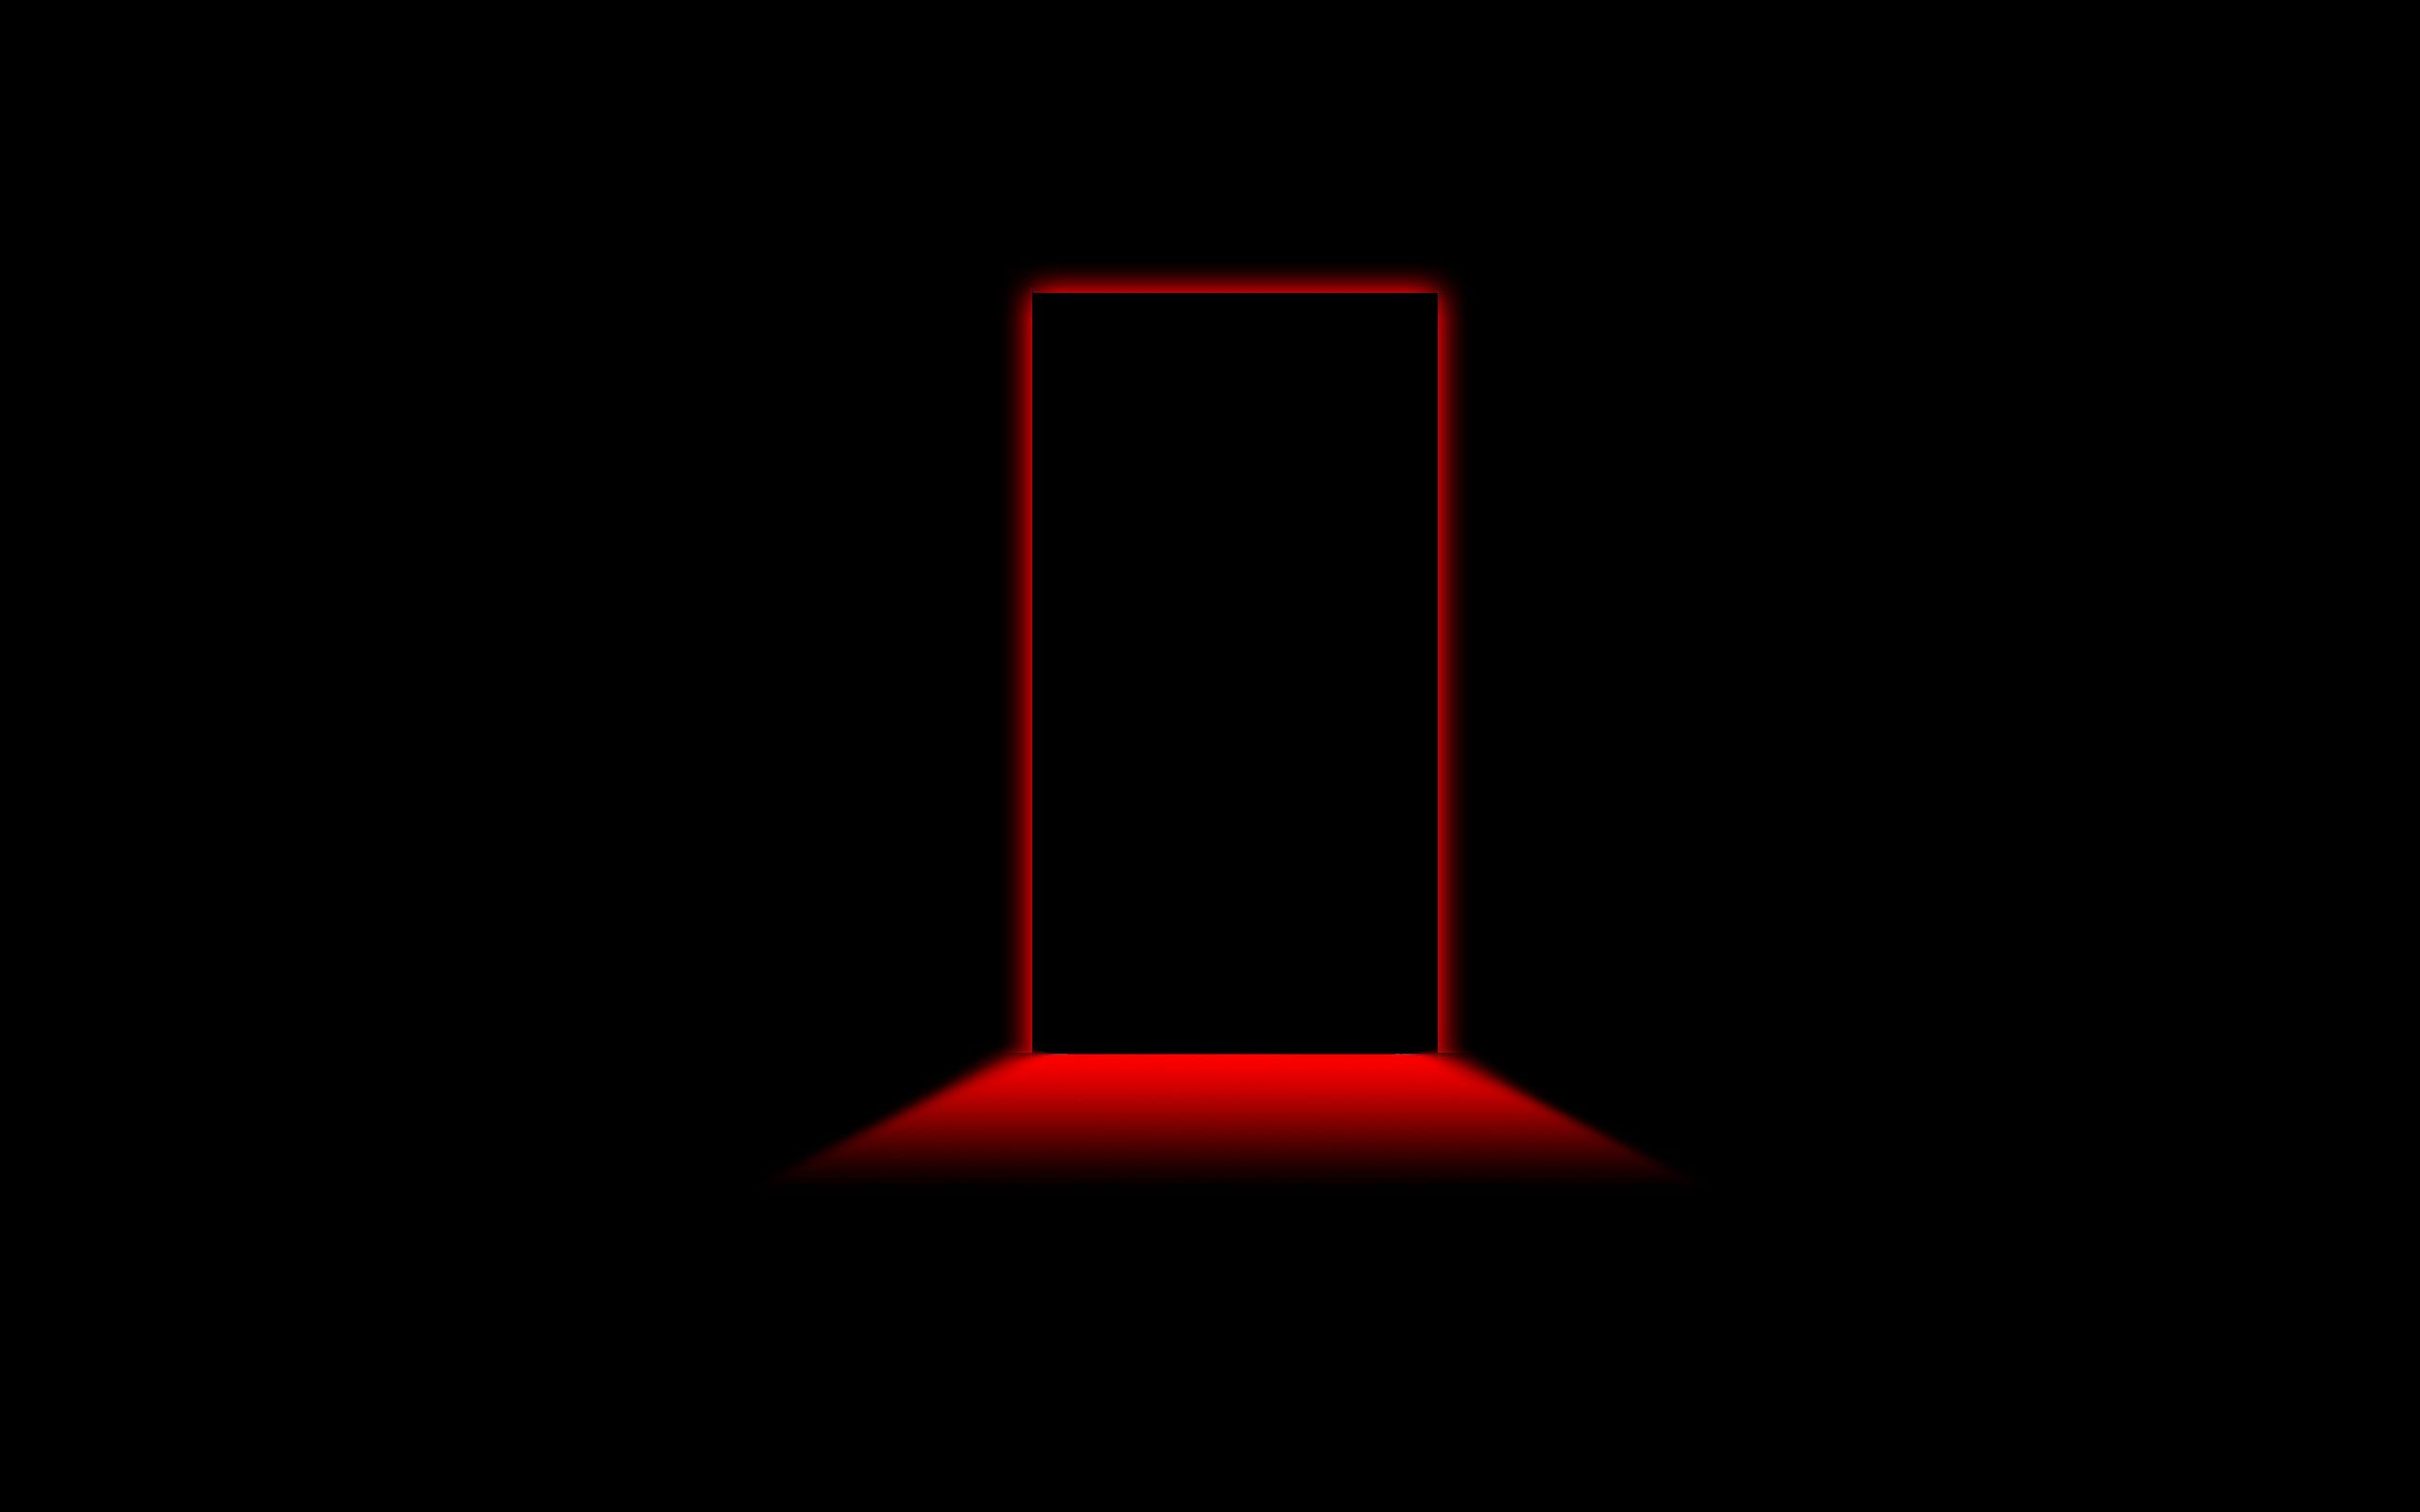 Image for Black Red Wallpapers HD Dekstop 7062 Backgrounds